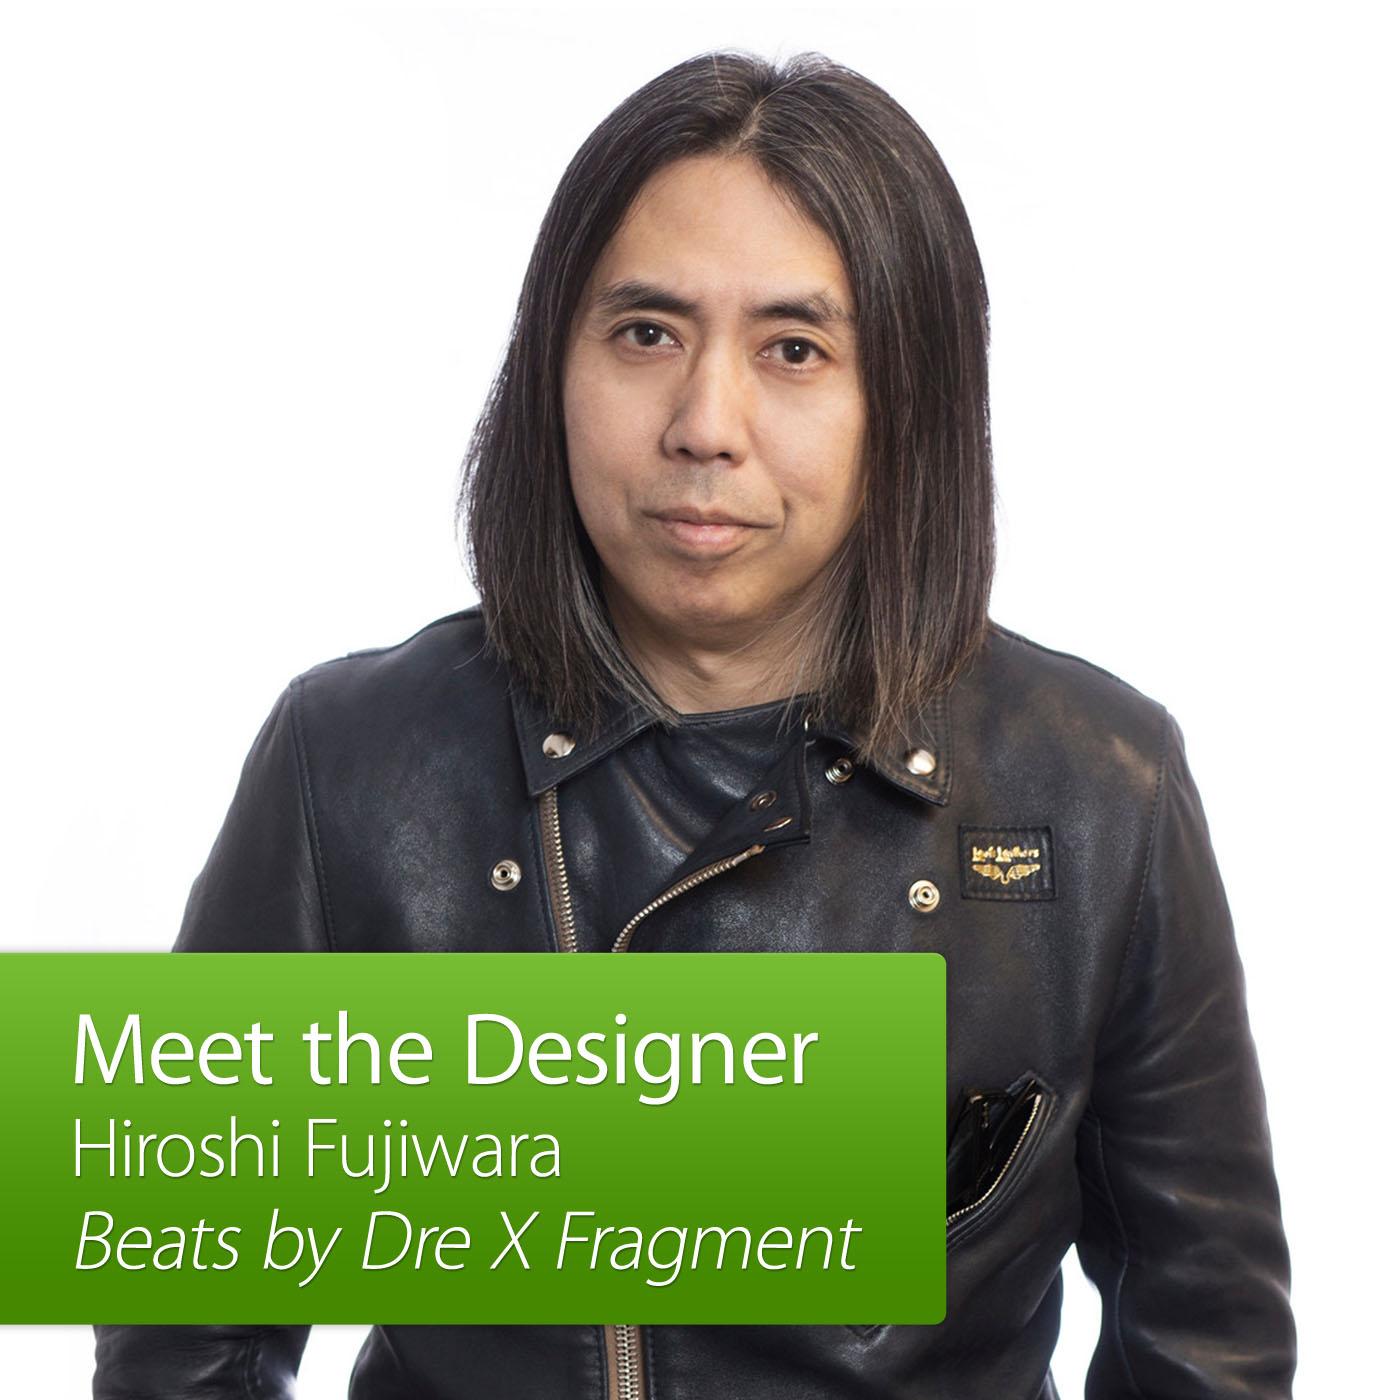 Hiroshi Fujiwara: Meet the Designer